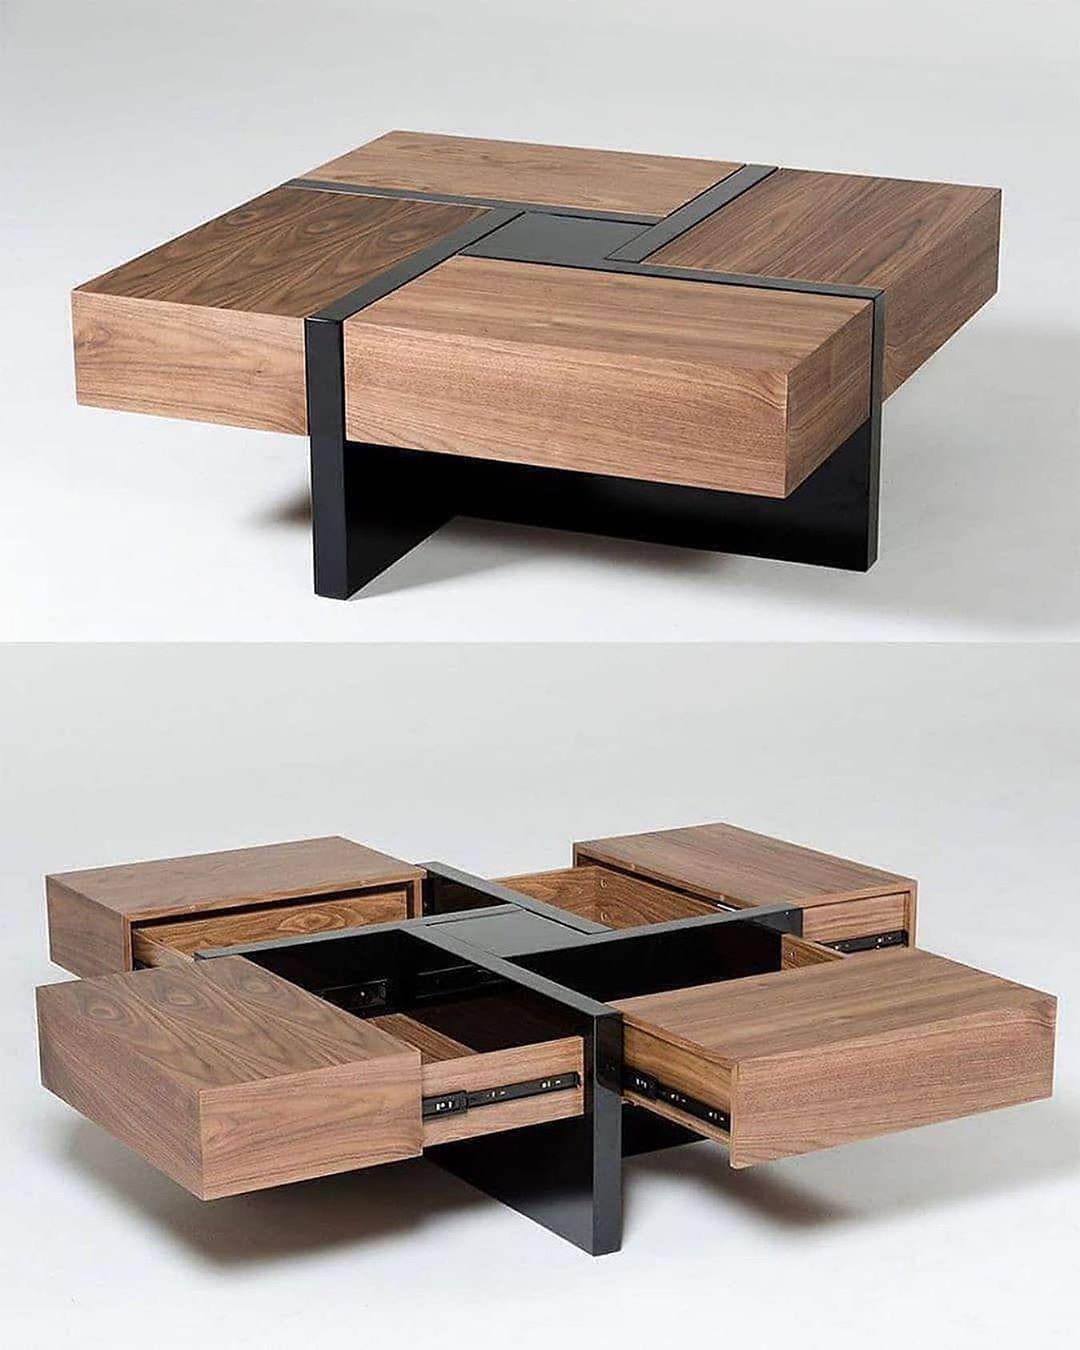 Fanciest Products On Instagram Coffee Table Via Homeadore Follow Us Fanciest Products Coffee Table Wood Coffee Table With Drawers Wood Table Design [ 1350 x 1080 Pixel ]